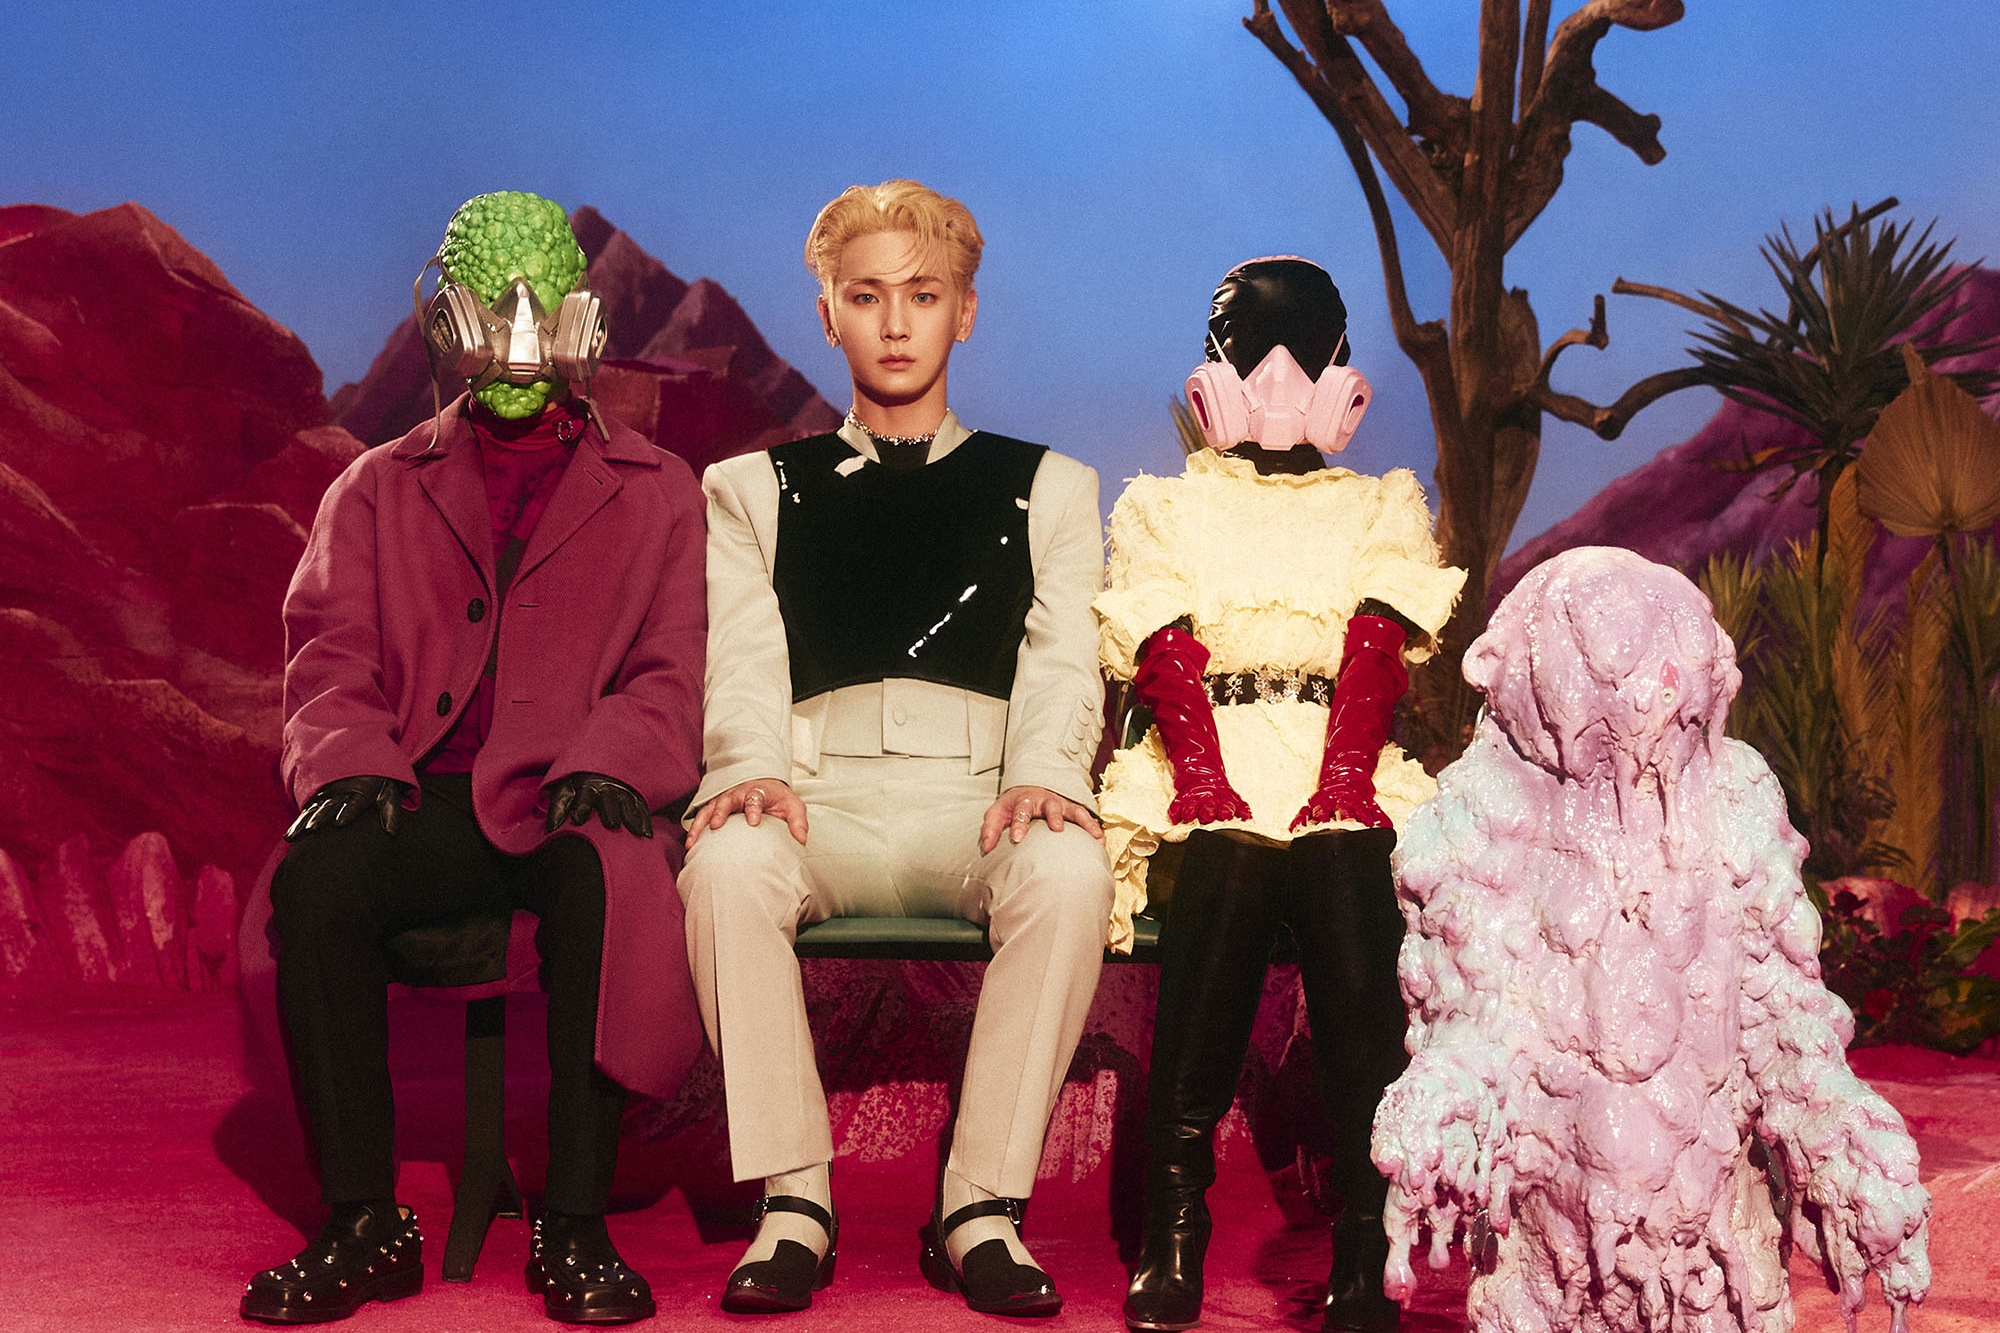 SHINee成员KEY首张迷你专辑《BAD LOVE》展现的丰富风格的音乐